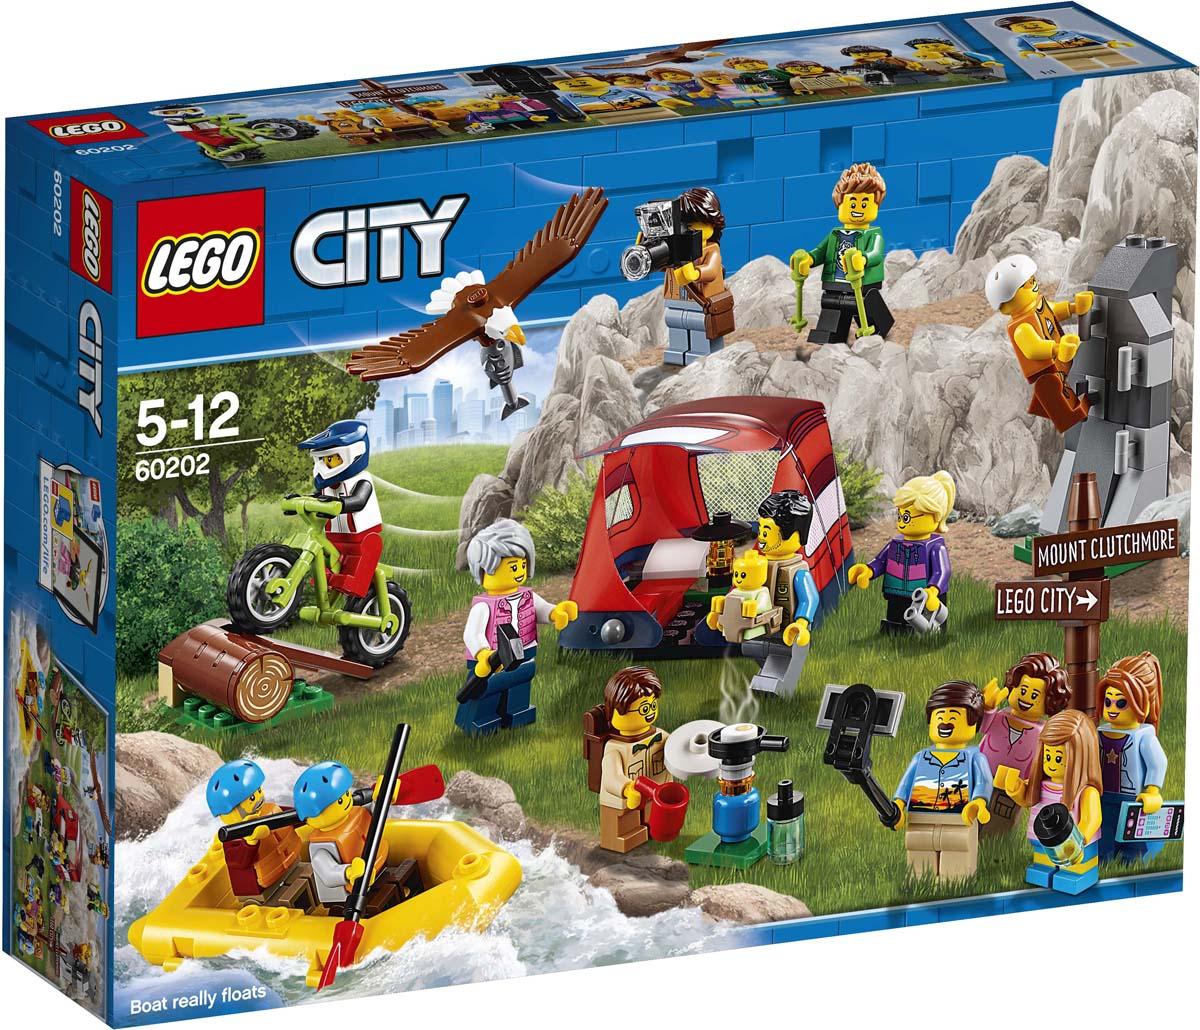 LEGO City Town 60202 Любители активного отдыха Конструктор конструктор lego любители активного отдыха 60202